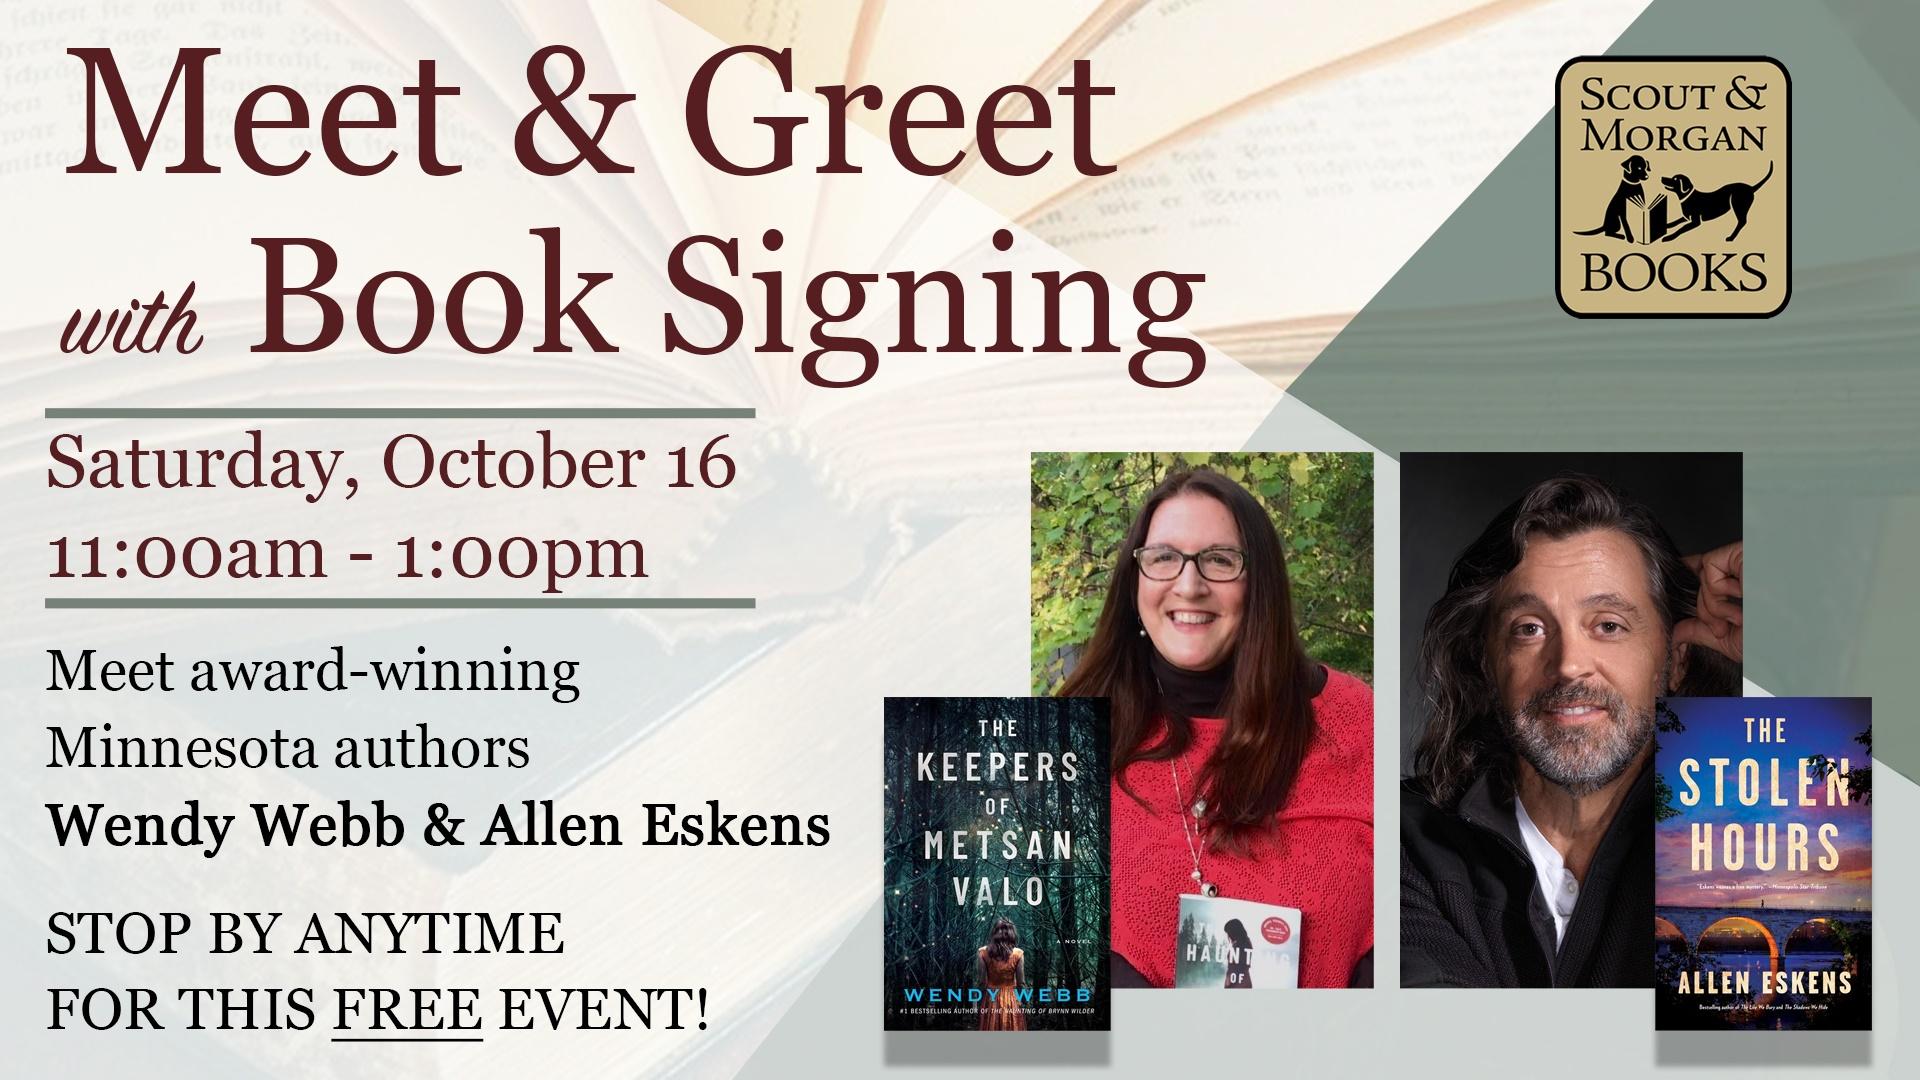 Meet Award-Winning Authors Wendy Webb & Allen Eskens